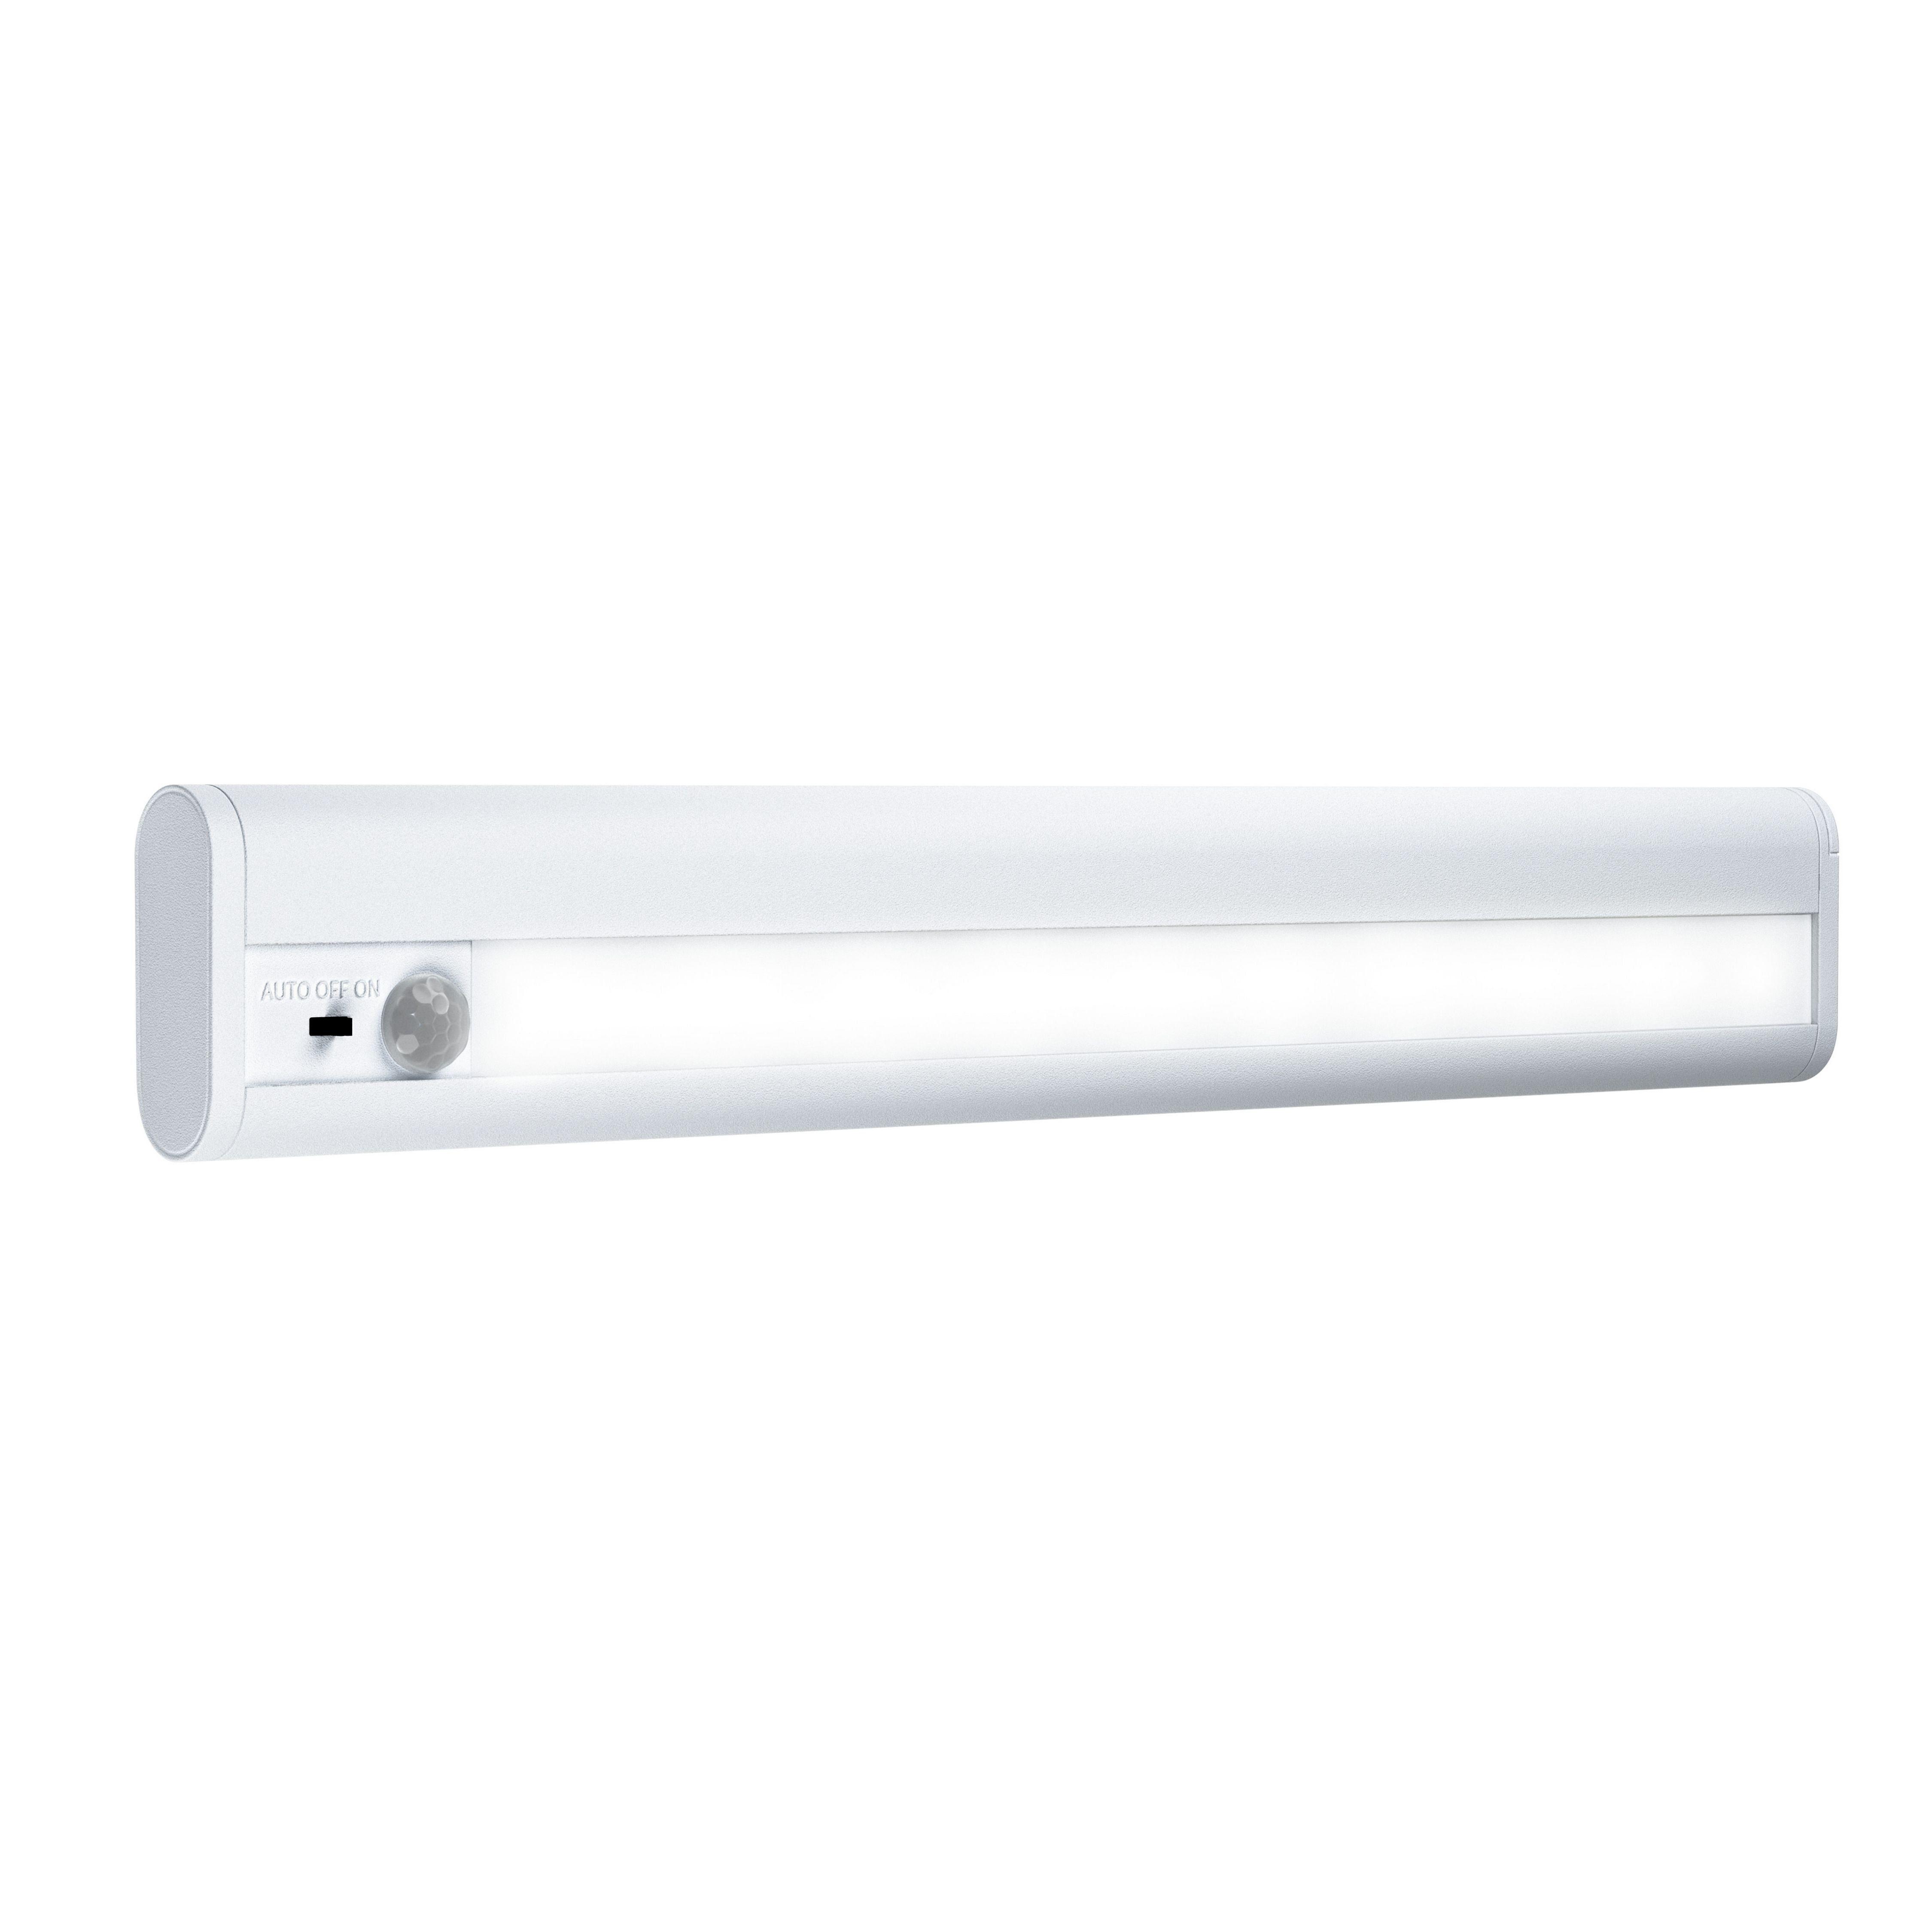 Osram Batteriebetriebene Sensor LED-Unterbauleuchte / 30cm »LinearLED Mobile 300«